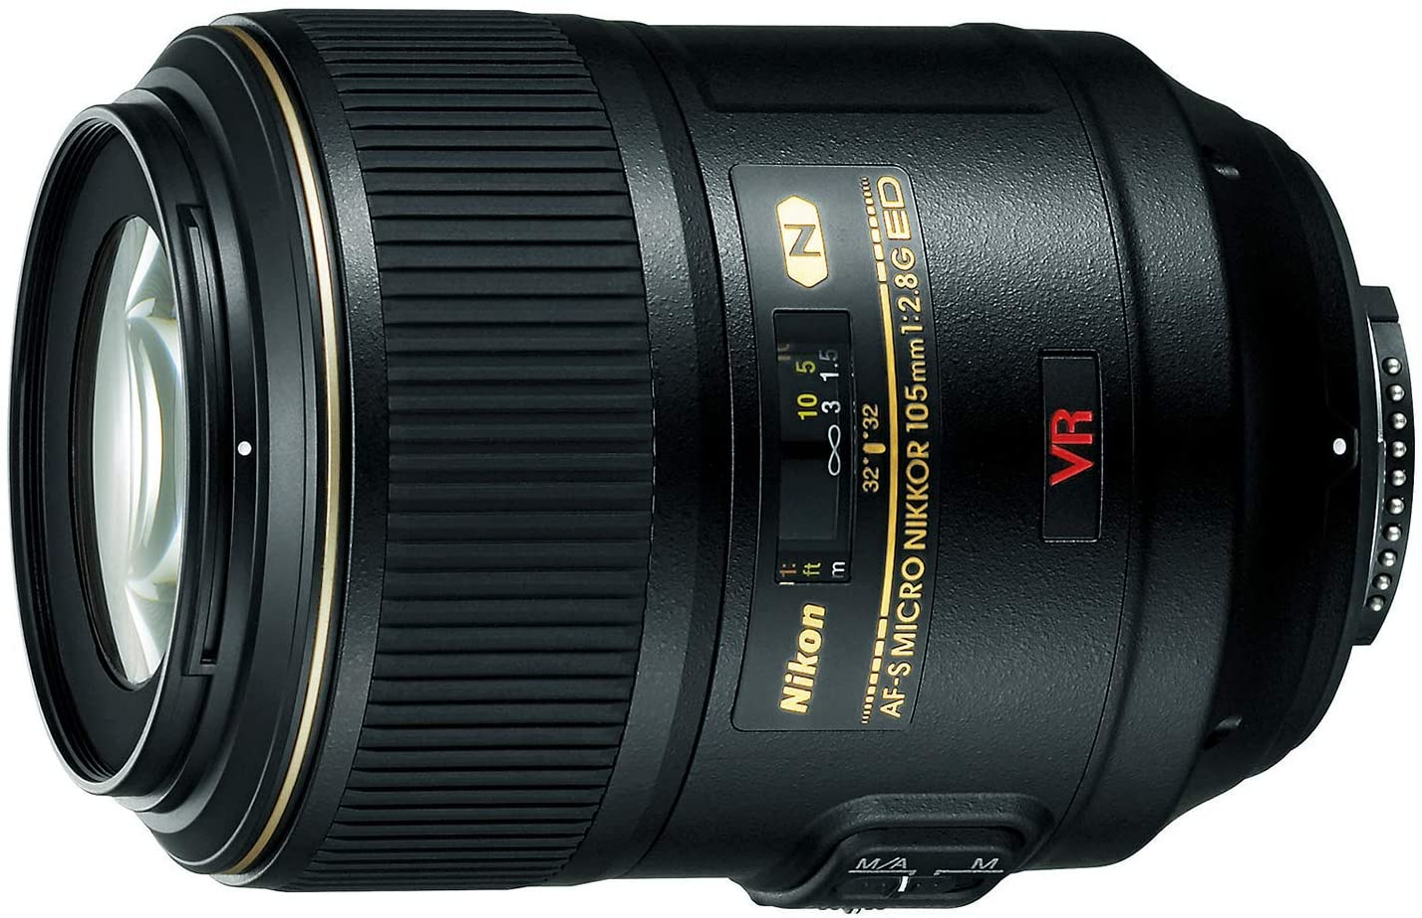 Nikon 単焦点マイクロレンズ AF-S VR Micro Nikkor 105mm f/2.8 G